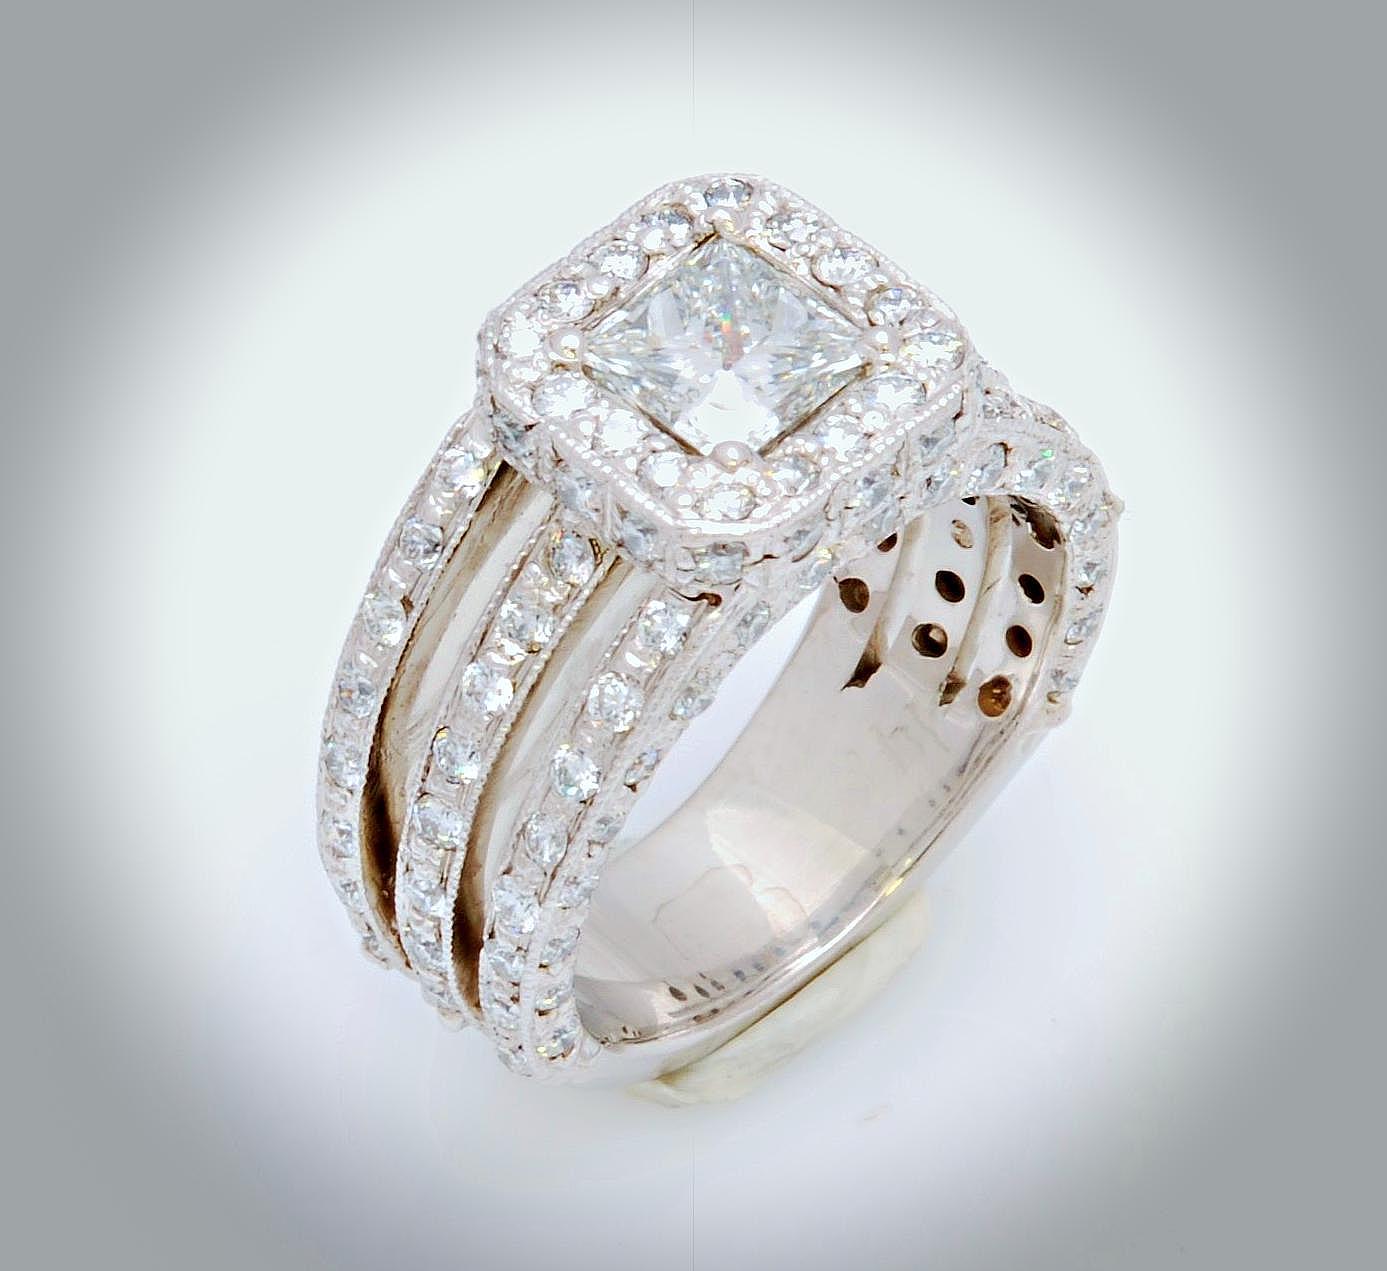 Williams Custom Jewelers Custom Jewelry in Salt Lake City Utah